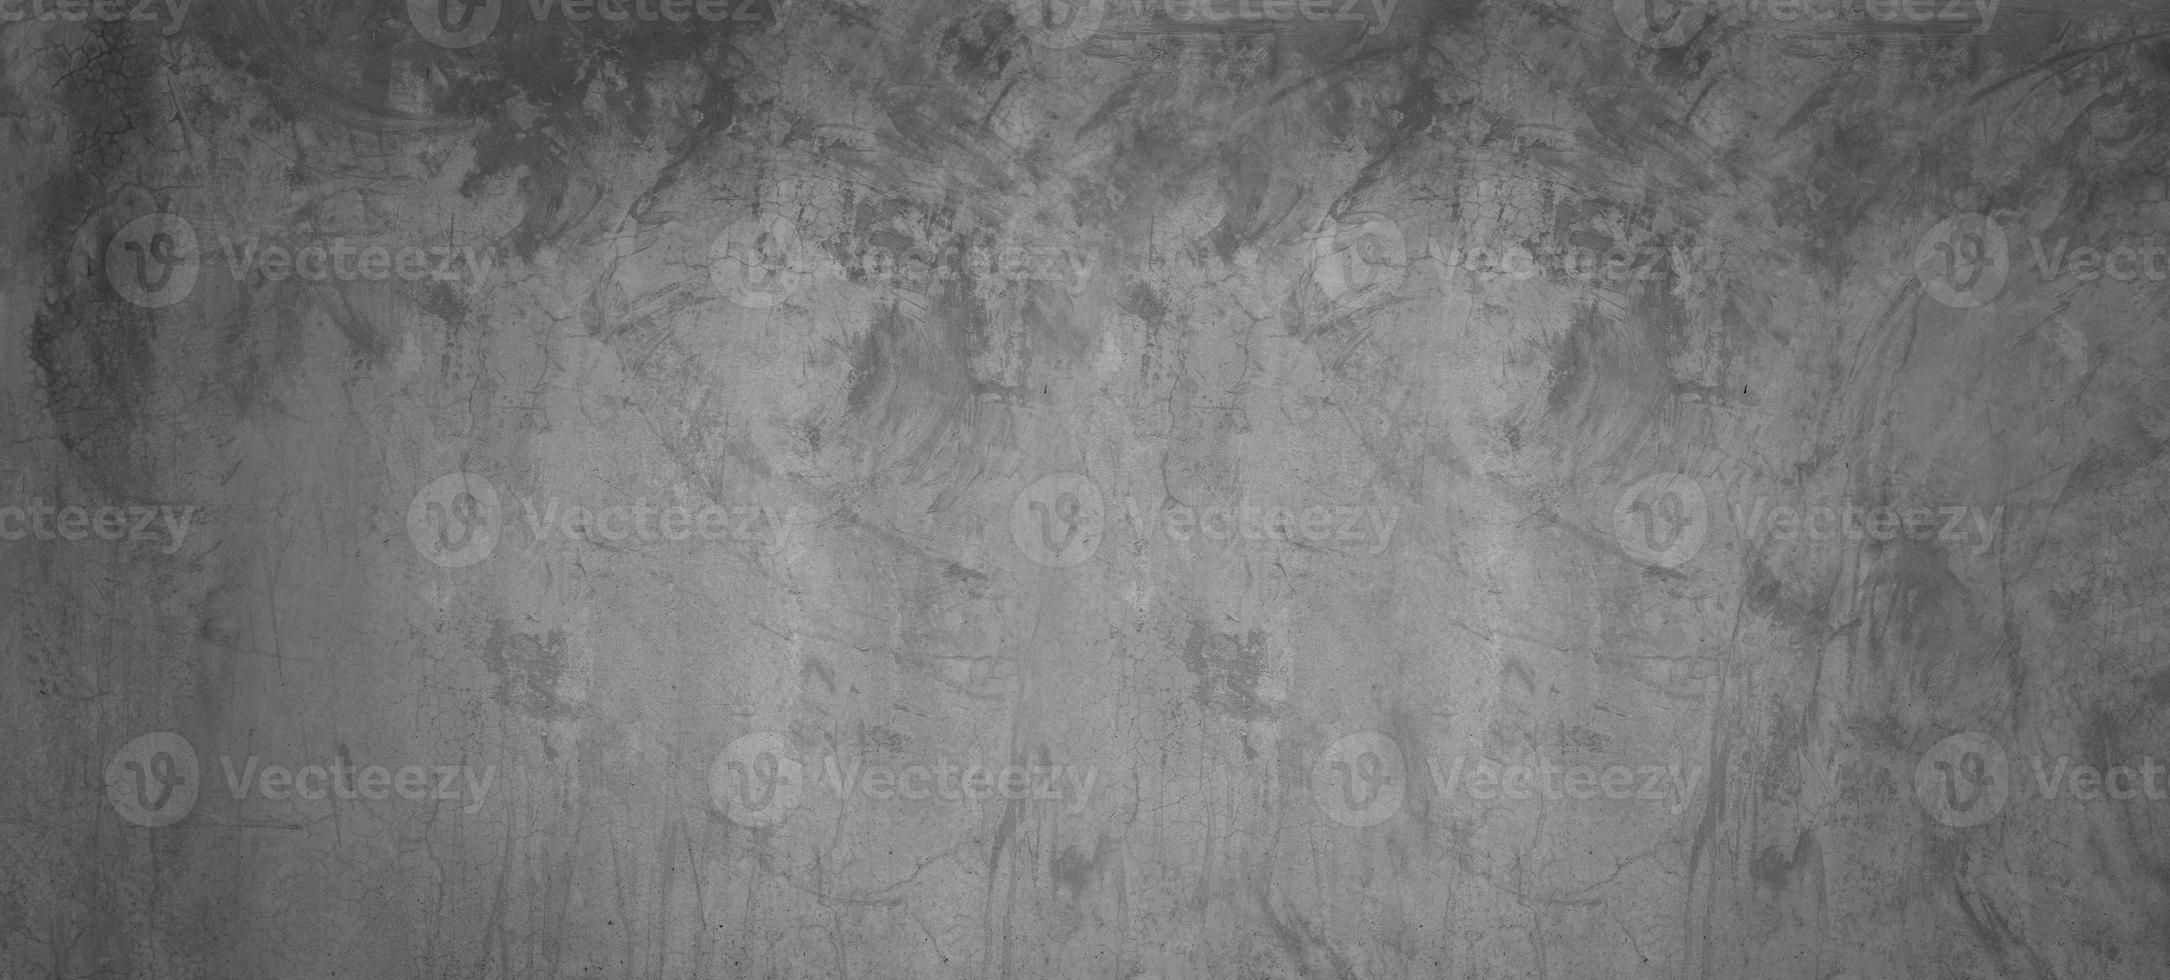 cimento cinza e preto ou parede de concreto para plano de fundo ou textura foto